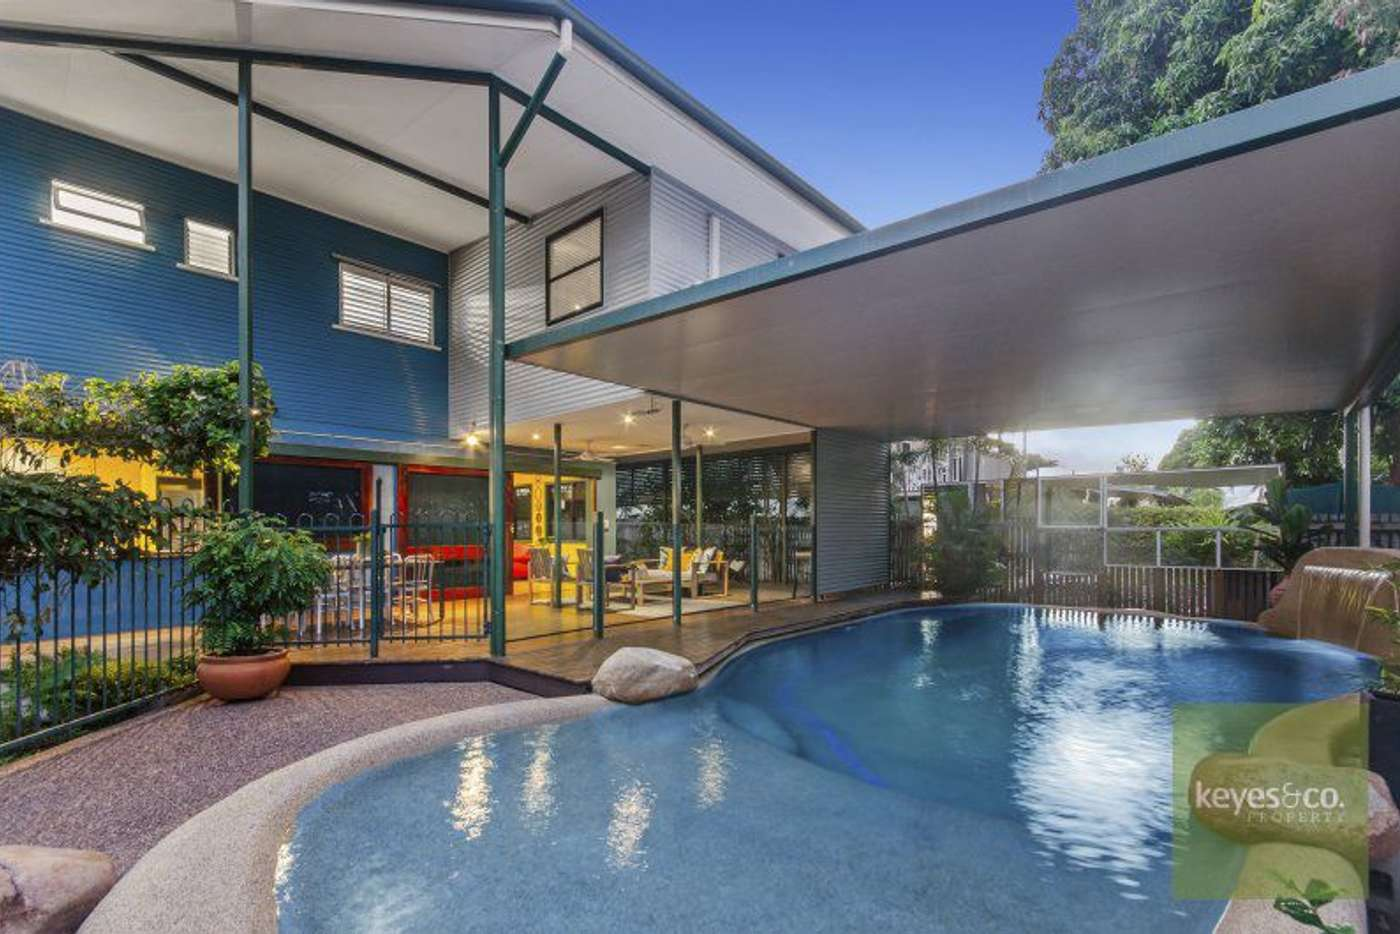 Main view of Homely house listing, 17 Werona Street, Mundingburra QLD 4812